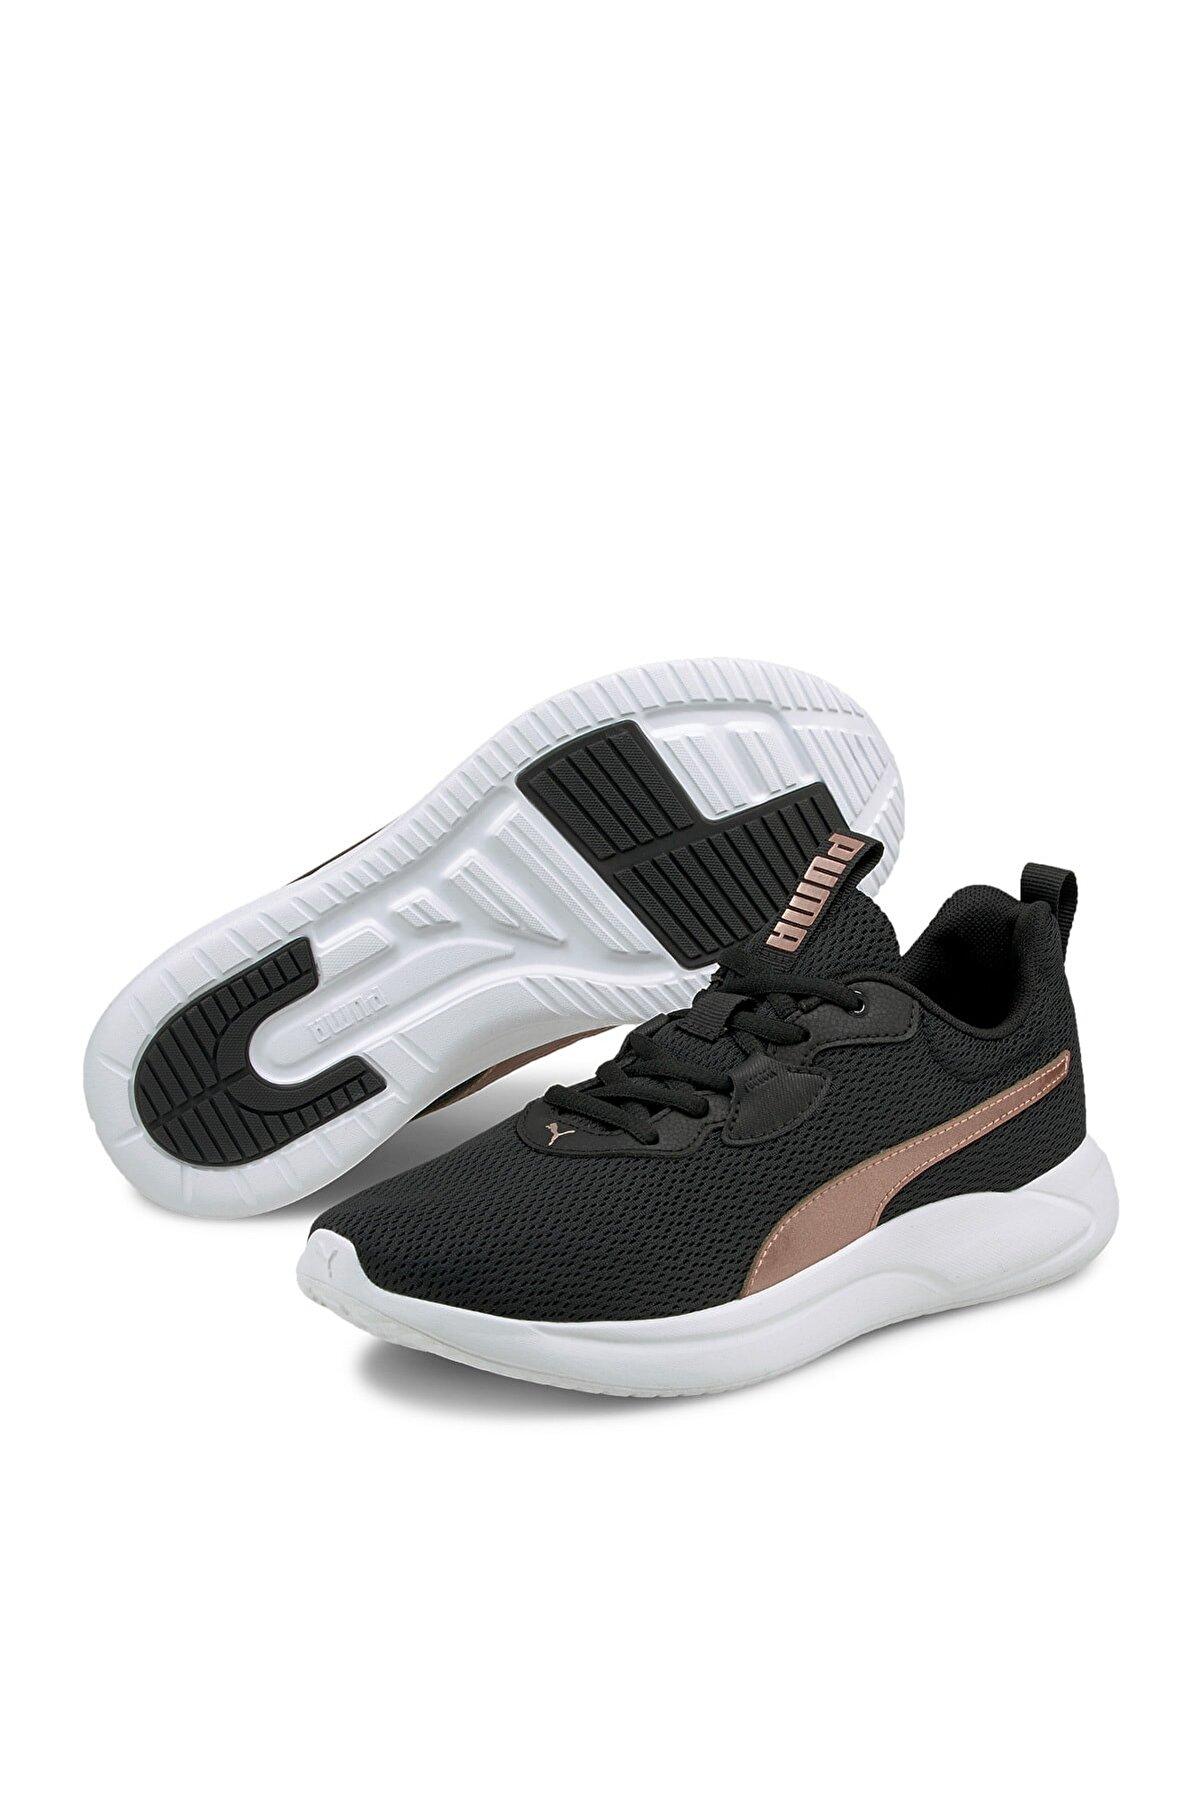 Puma Kadın Sneaker - Resolve Metallic Wn s - 19506301